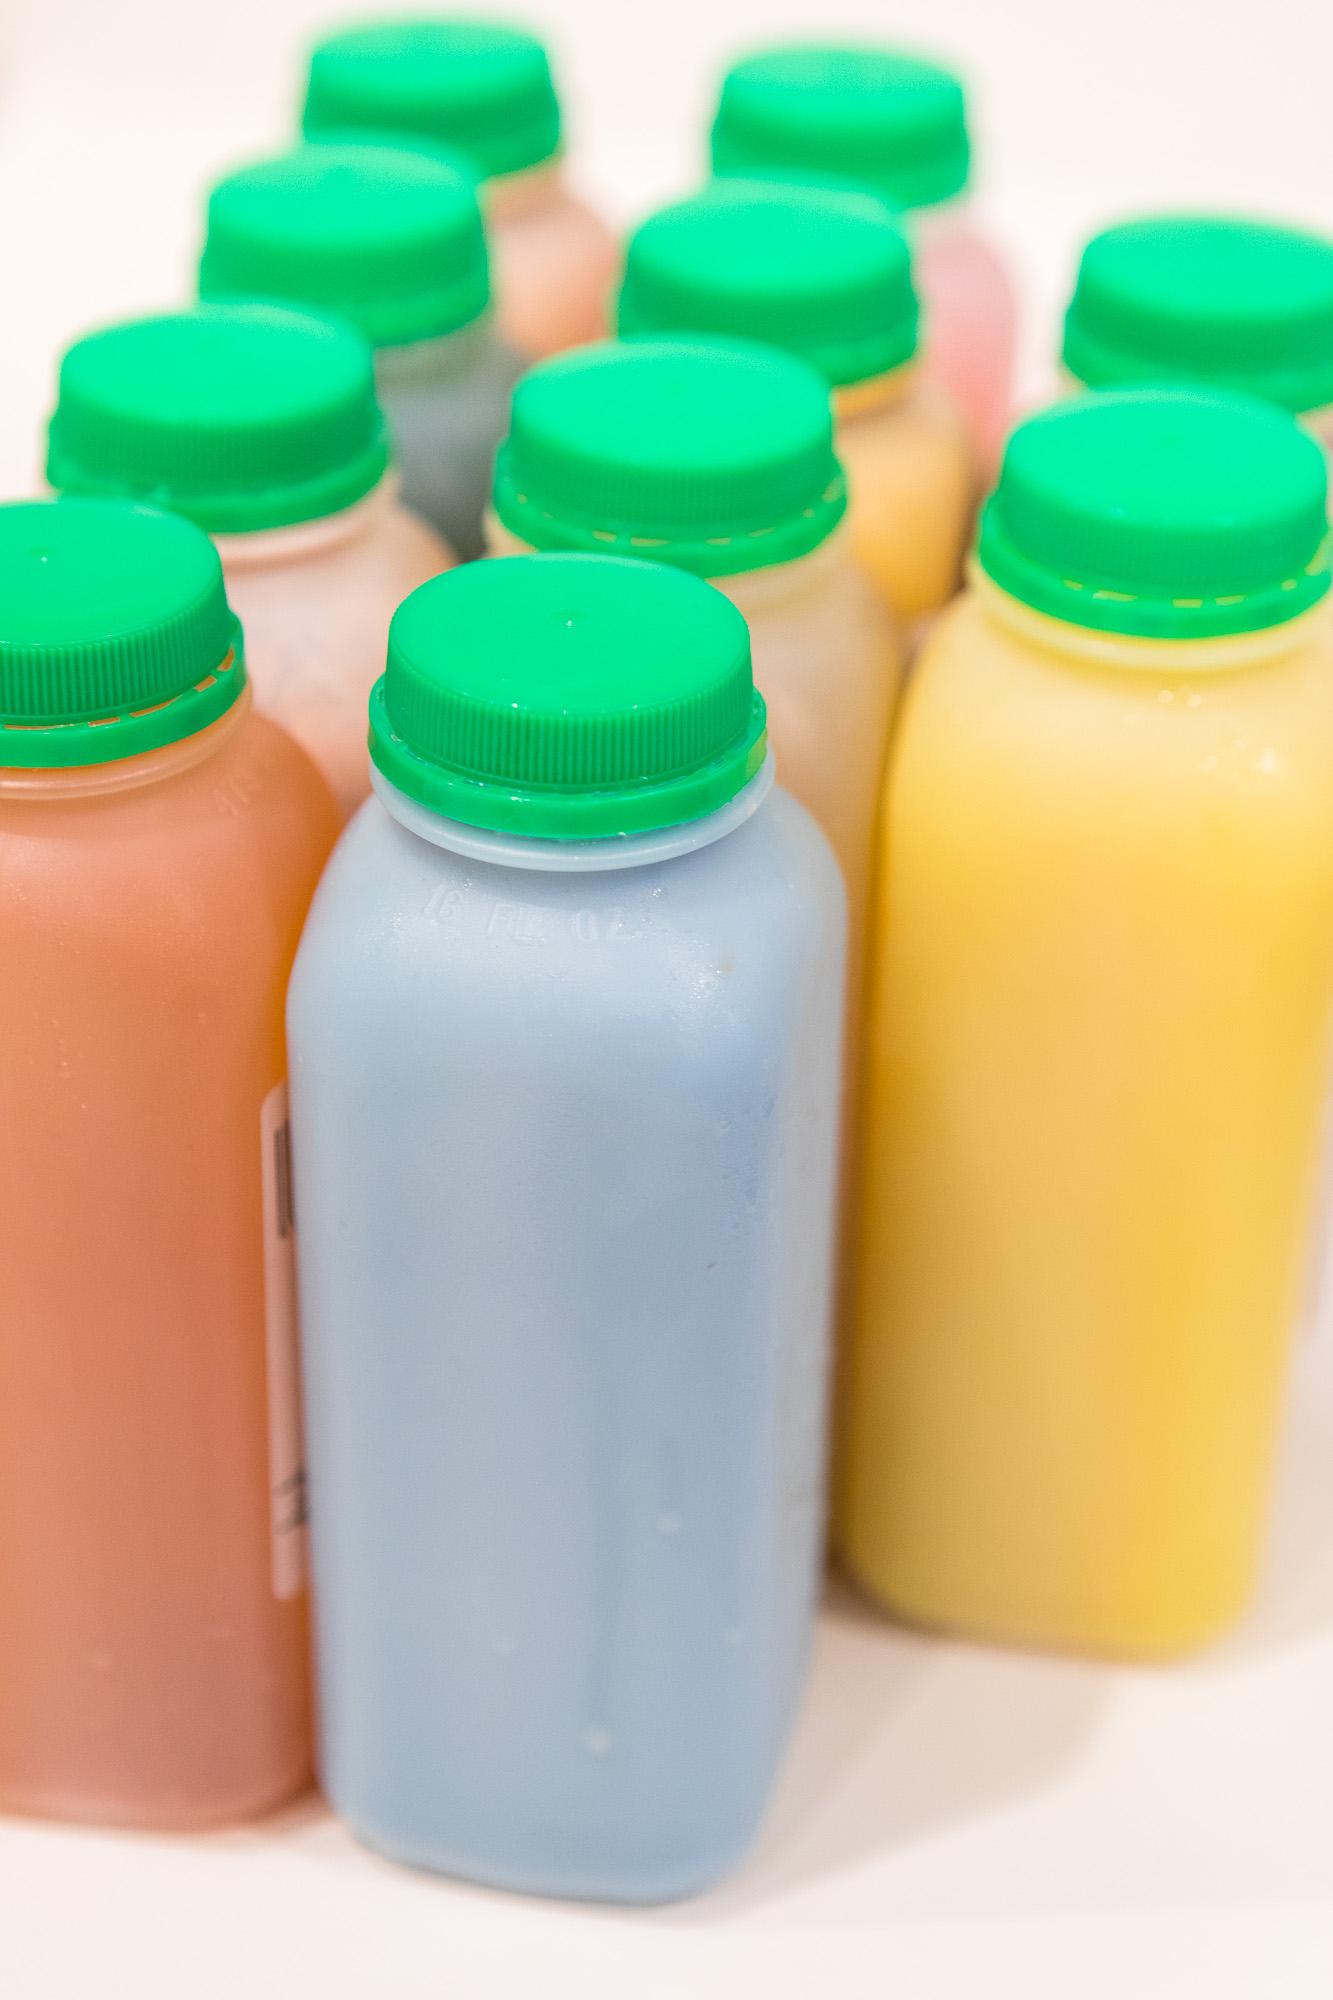 Maka-paia-maui-fresh-bottled-juices-3.jpg